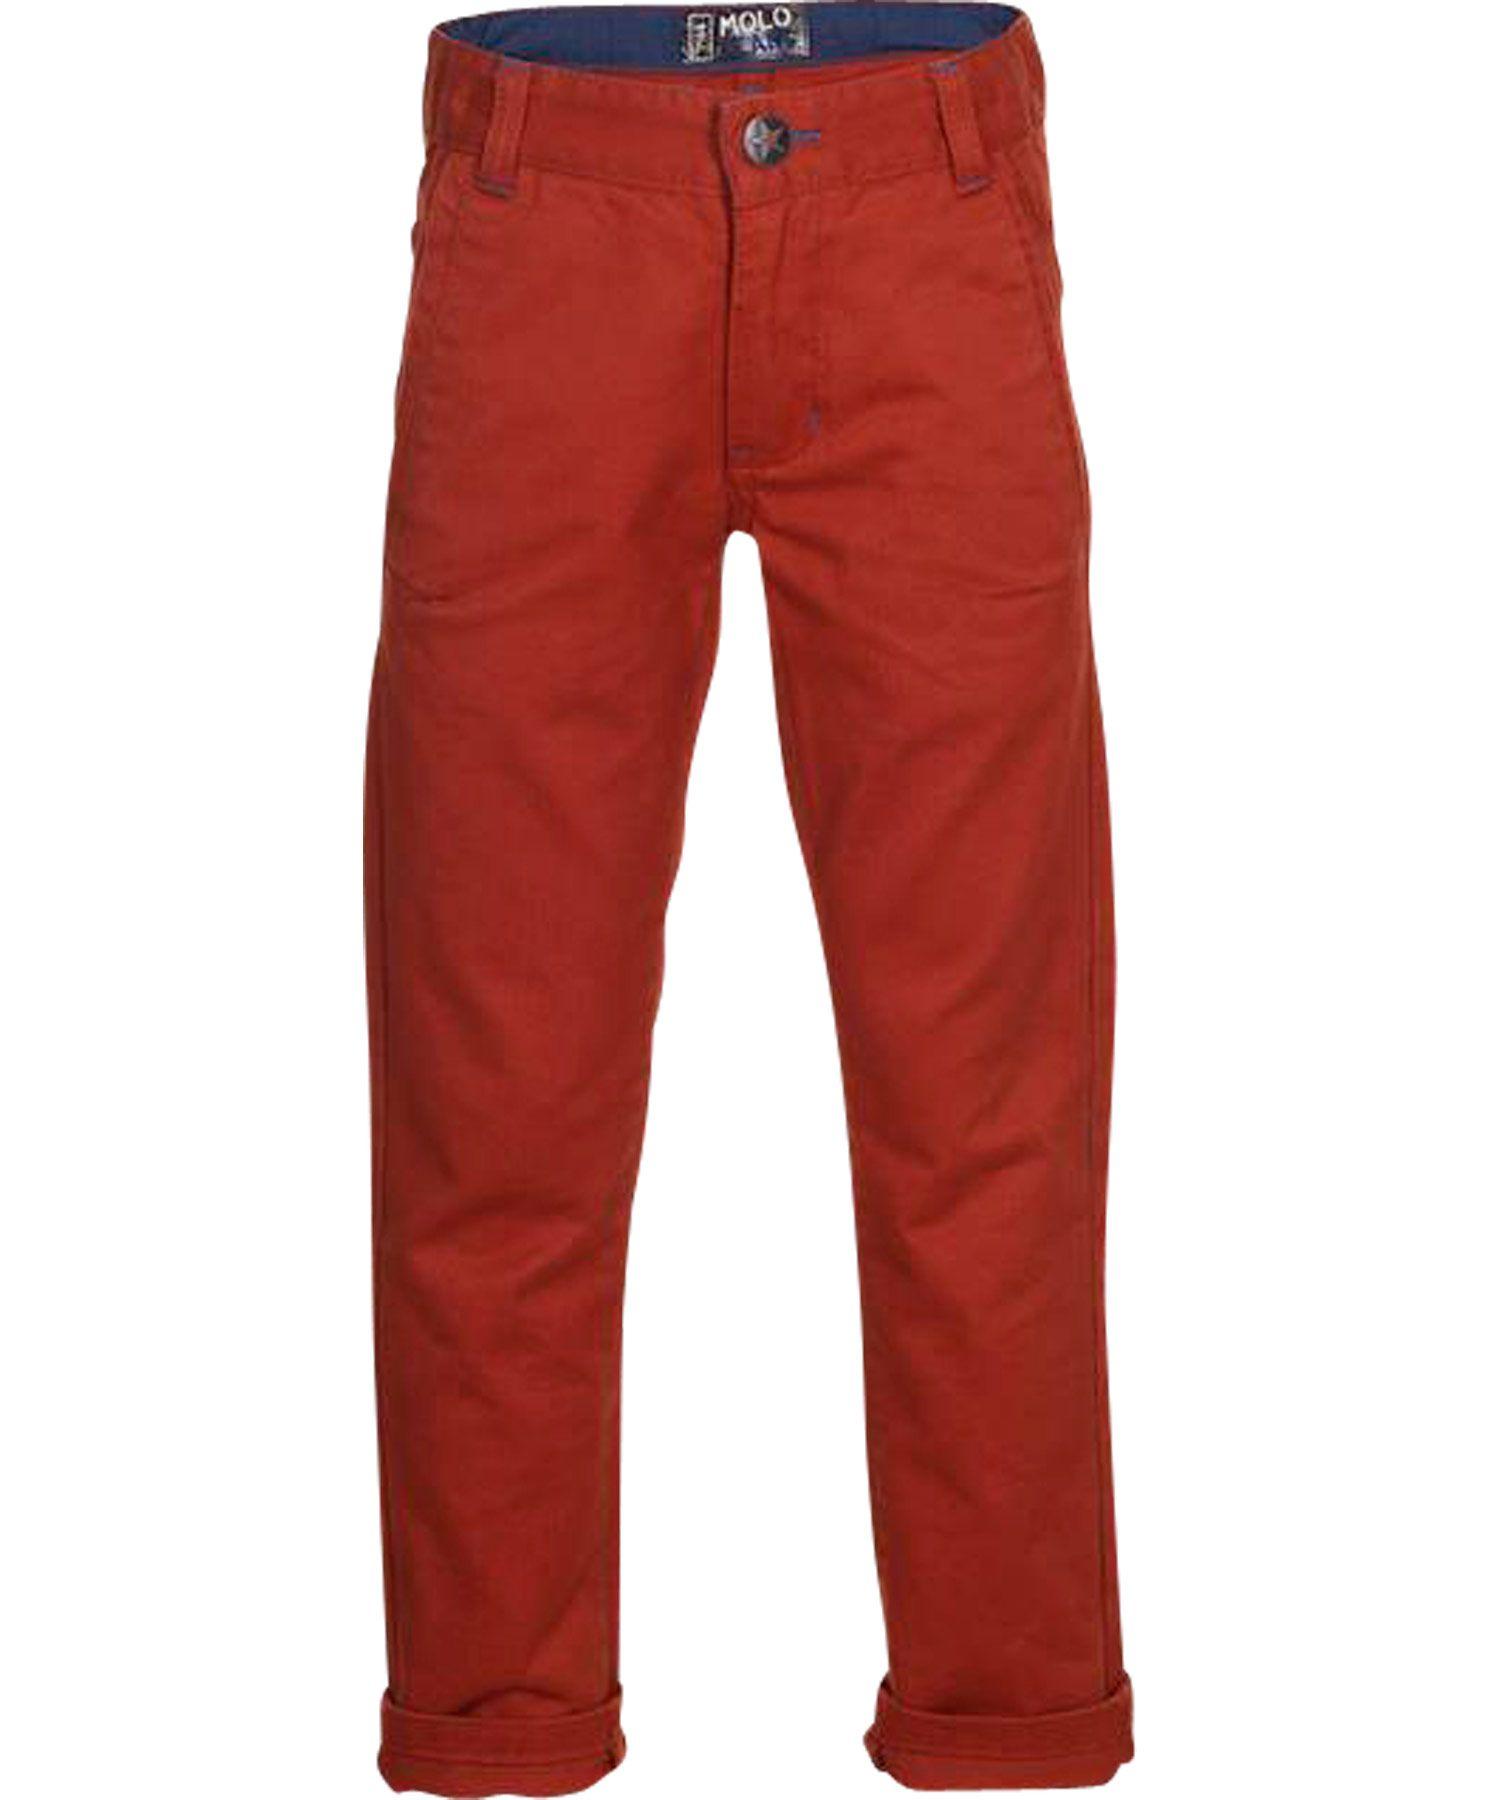 9d996fbbf5b17ff942595a50007a2860 - Red Button Korte Broek Sale